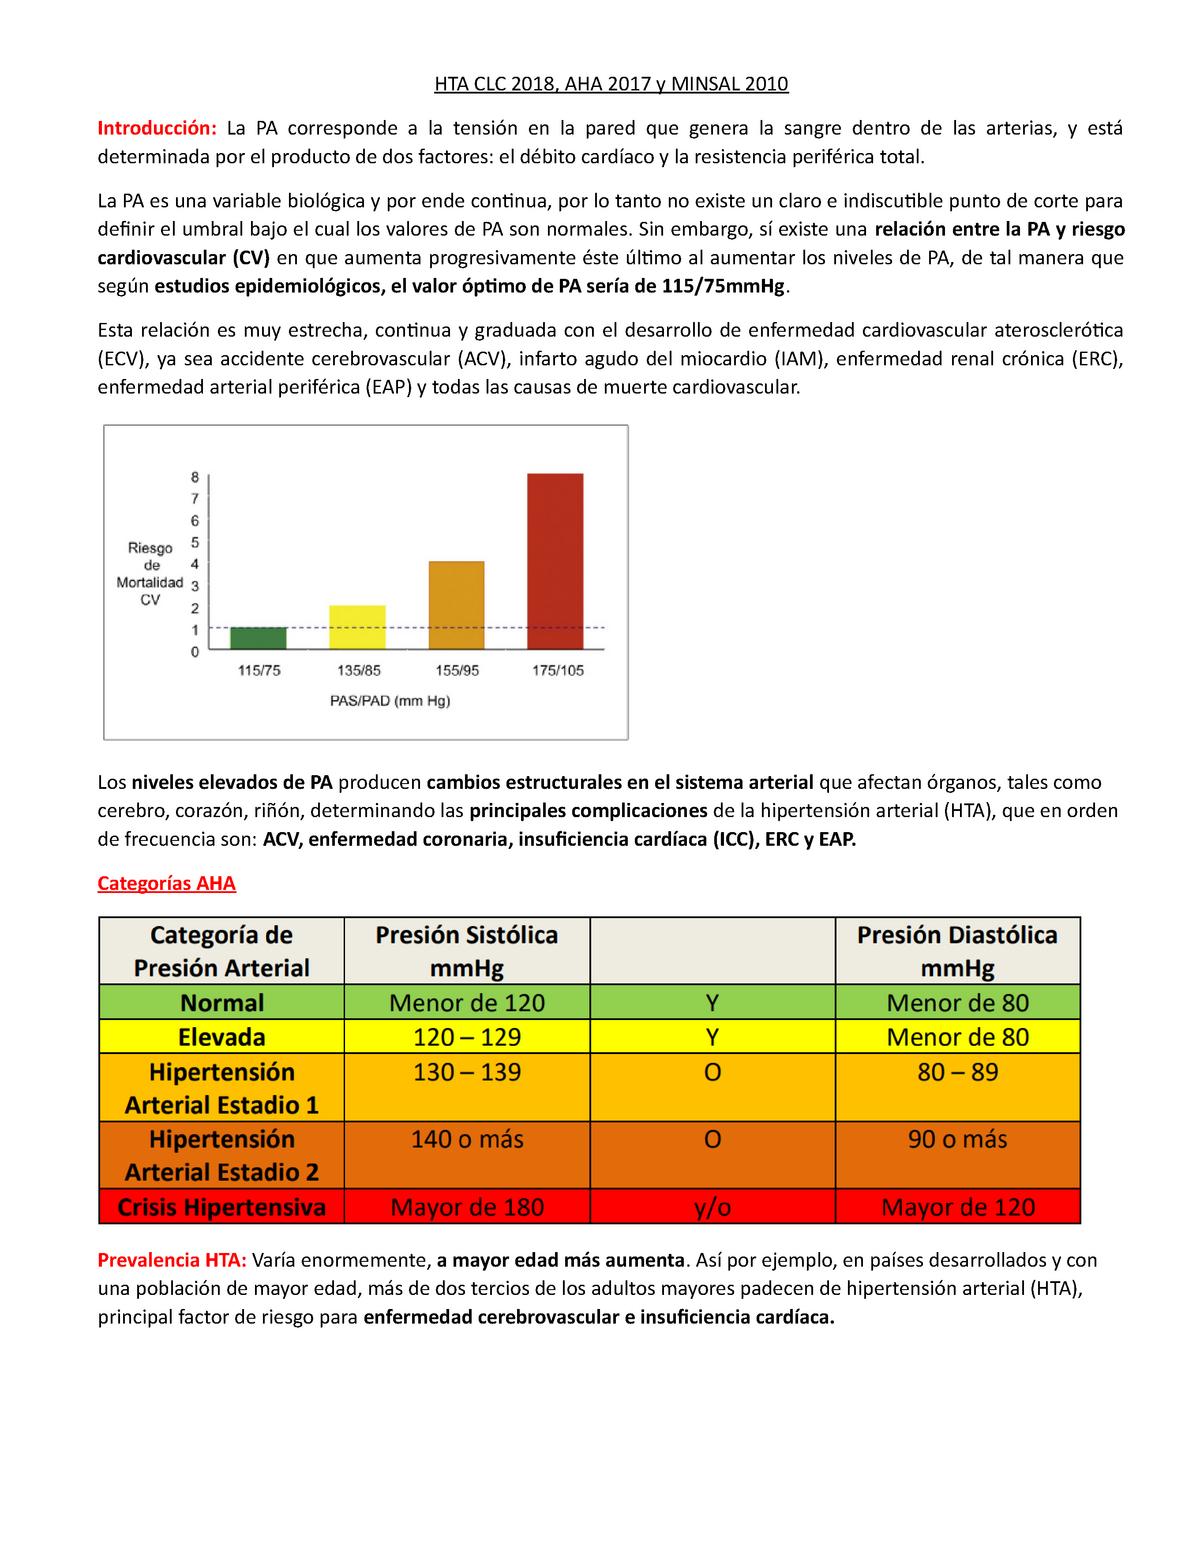 Valores de hipertension arterial